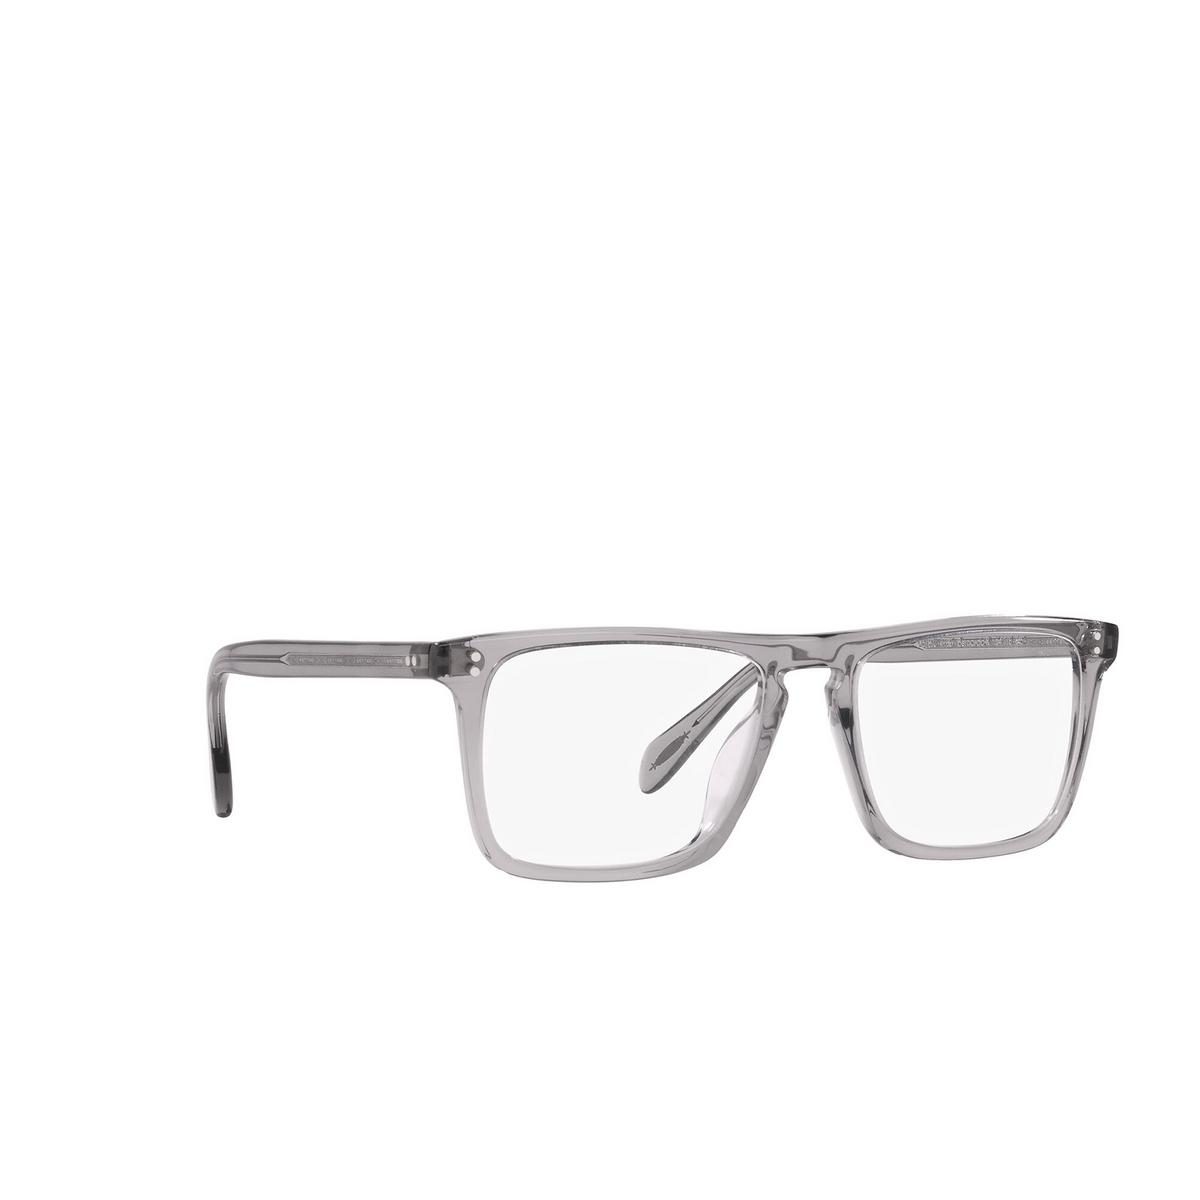 Oliver Peoples® Square Eyeglasses: Bernardo-r OV5189U color Workman Grey 1132 - three-quarters view.